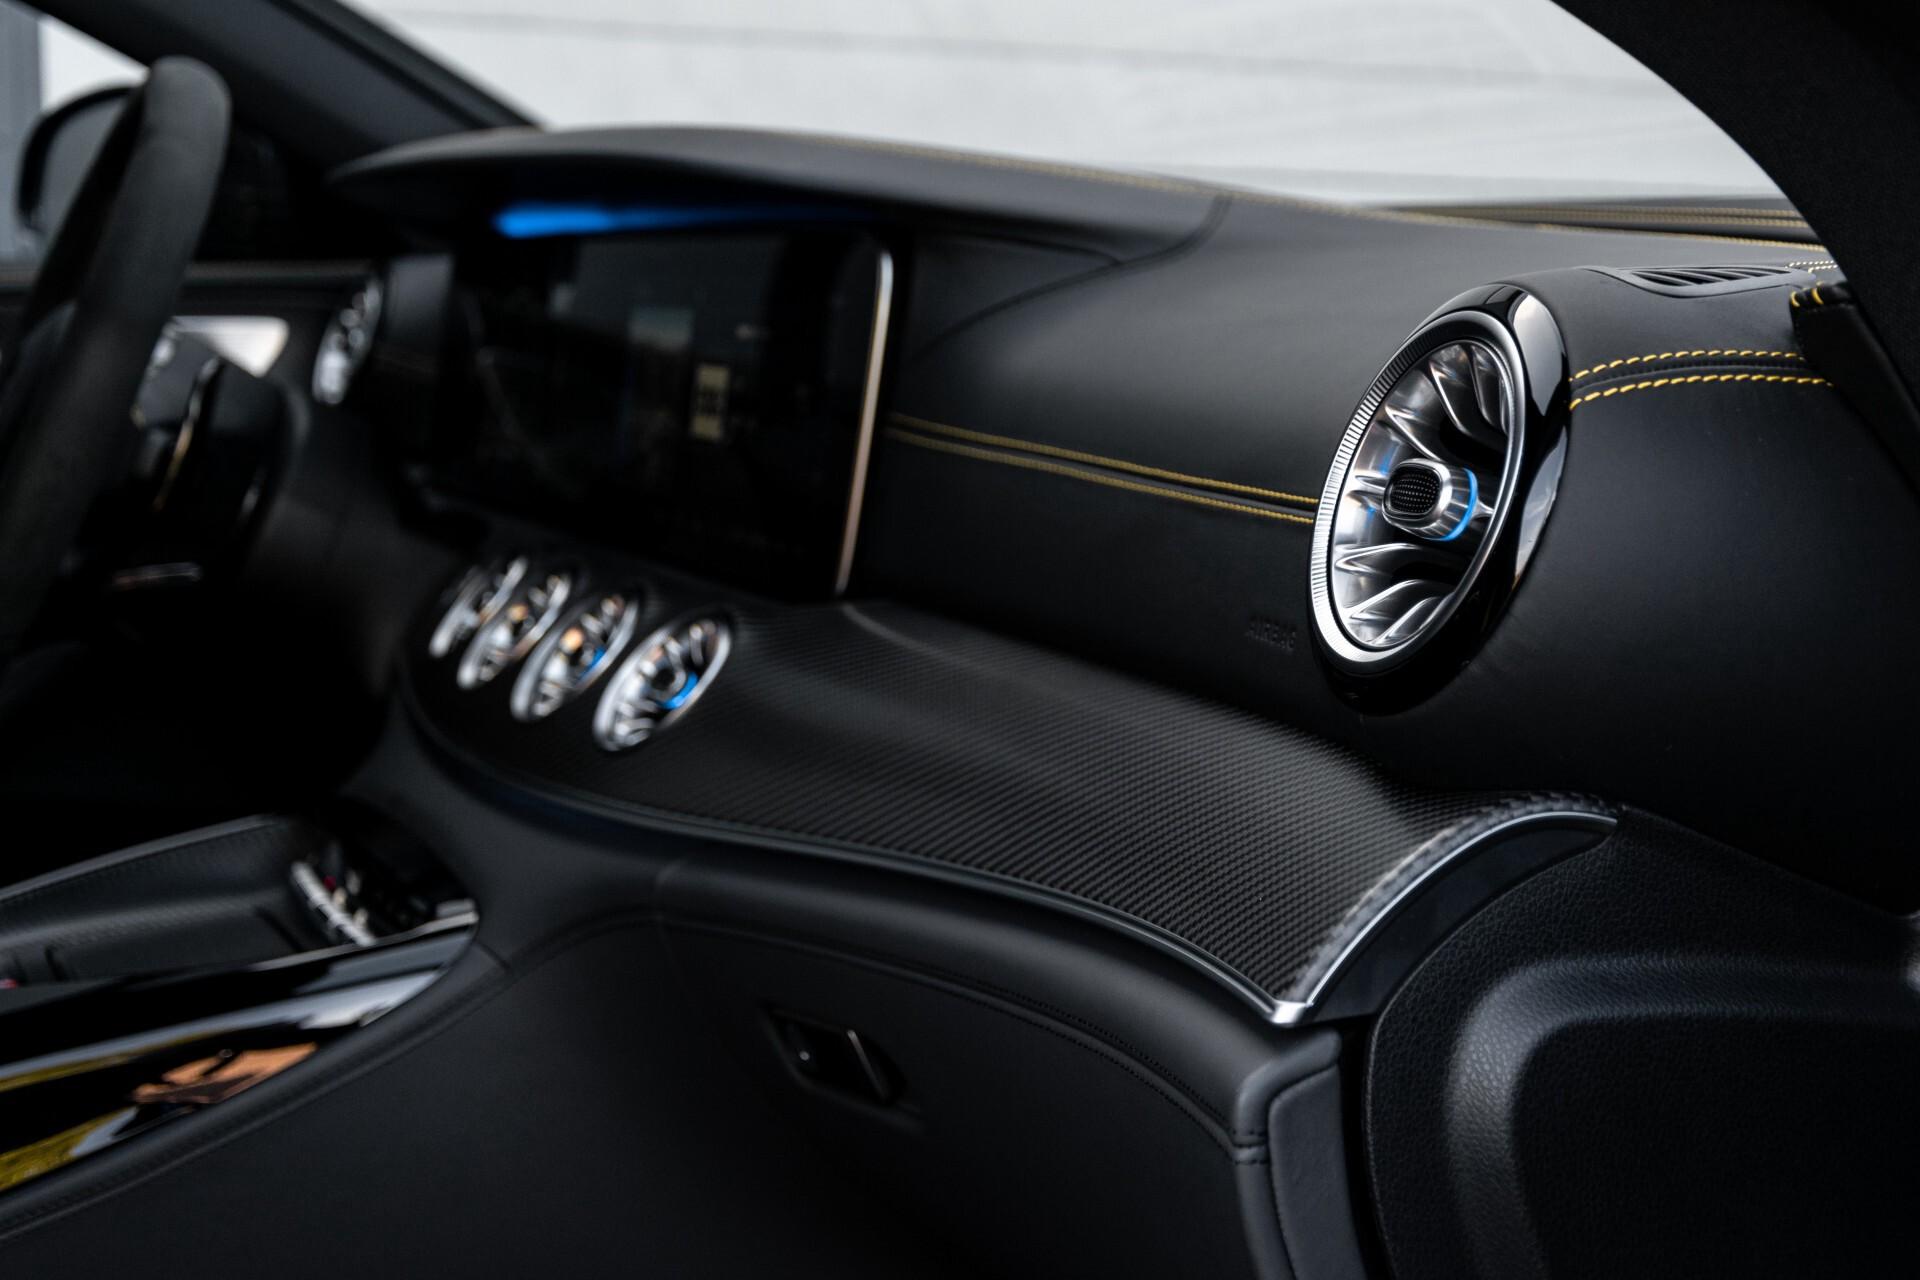 Mercedes-Benz AMG GT 4-Door Coupe 63 S 4MATIC+ Edition 1 Keramisch/Carbon/First Class/Dynamic Plus/Burmester High End 3D Aut9 Foto 66